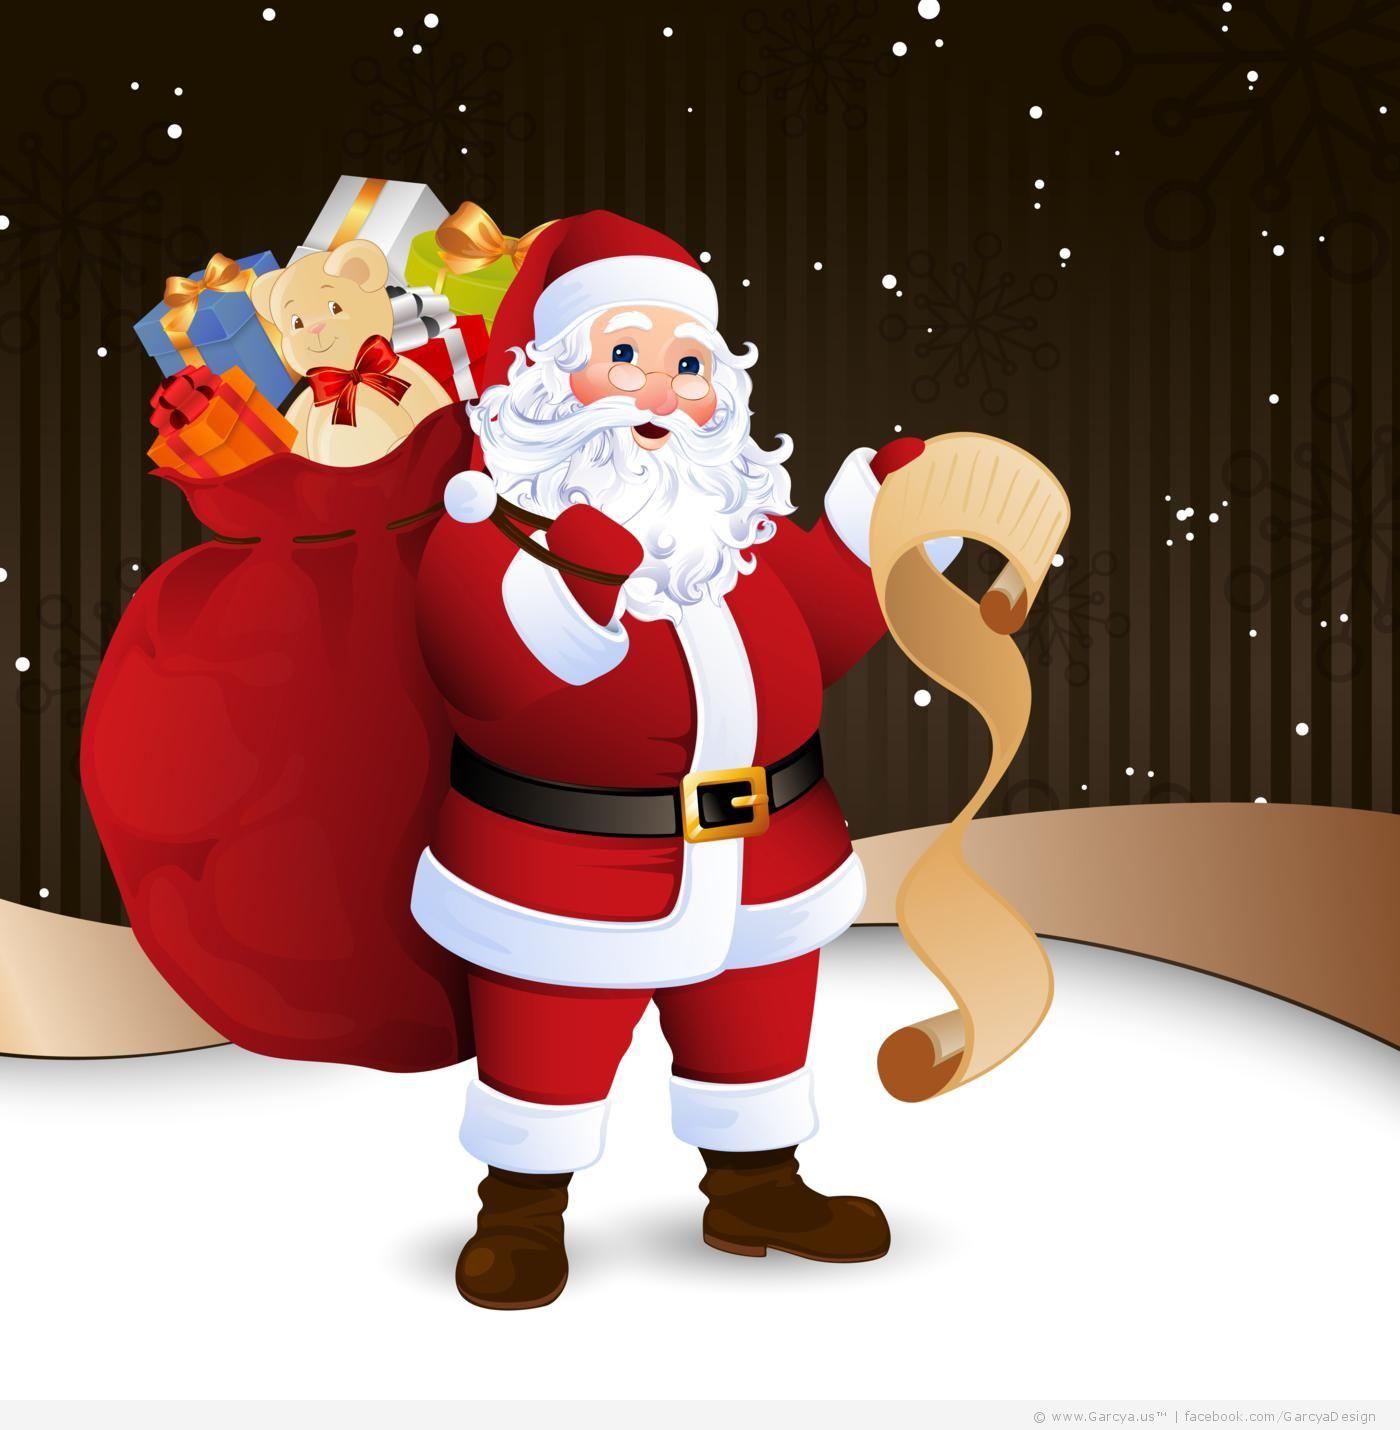 5 Free Vectors with Santa Claus